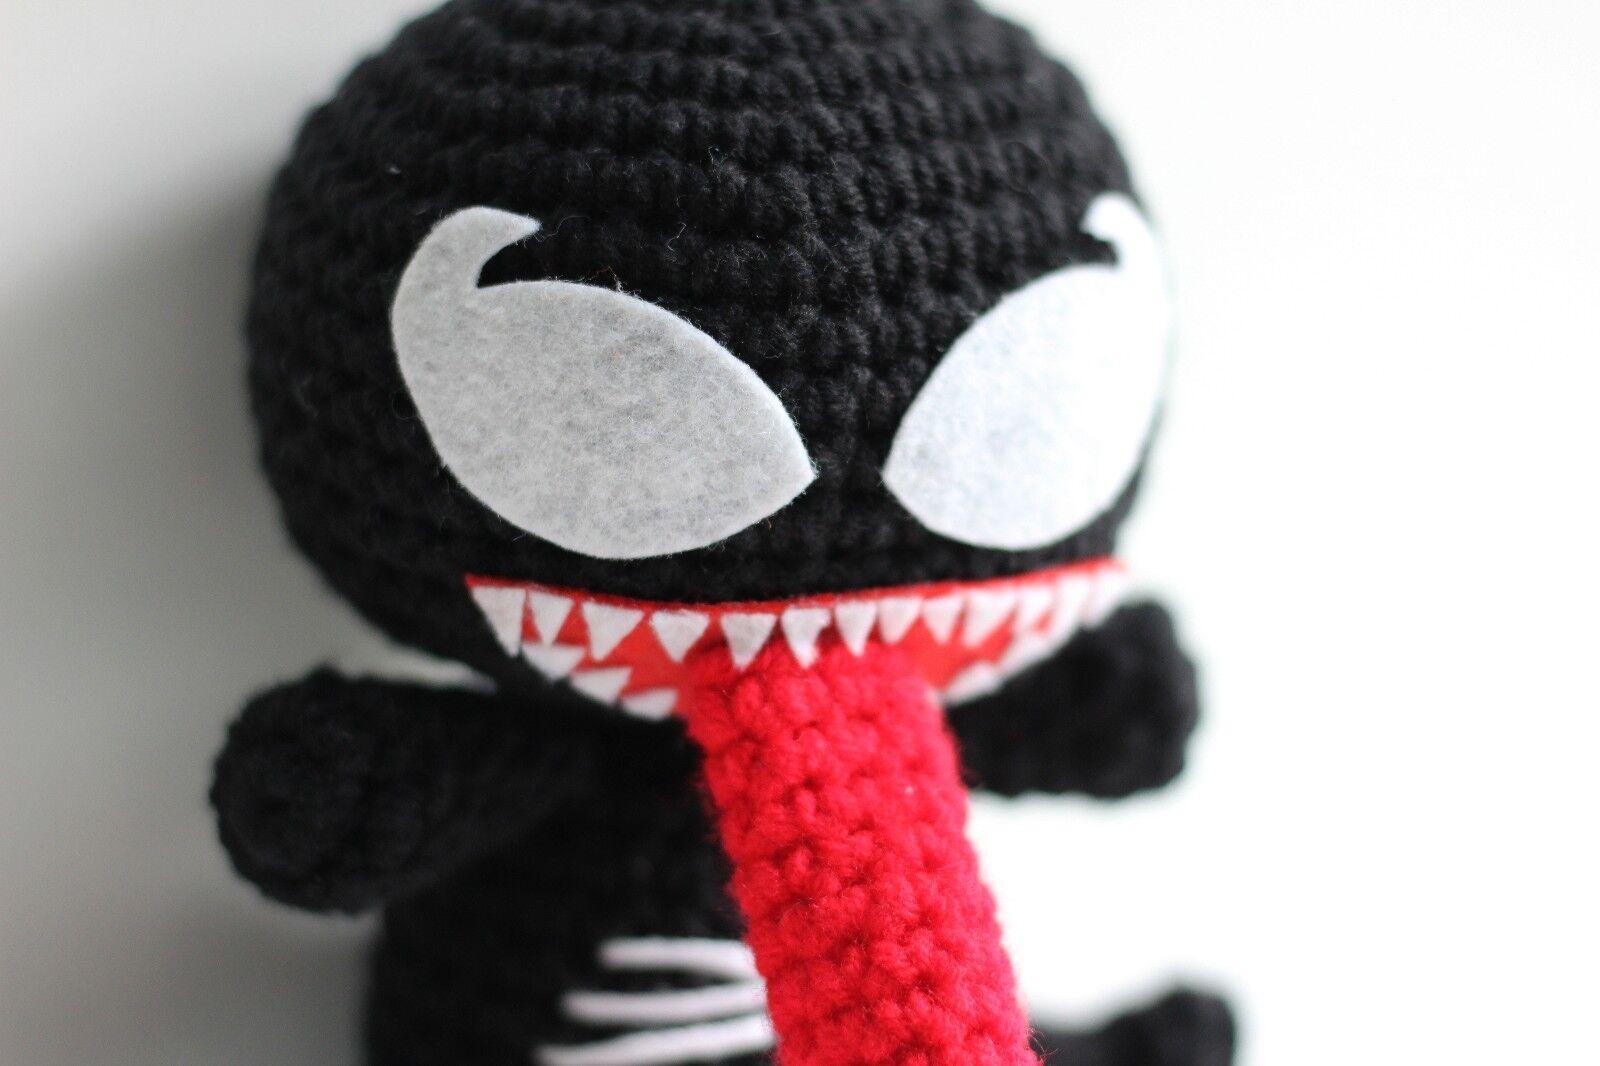 Venom amigurumi crochet toy for geek comics hero alien | Etsy | H.i.s | 1066x1600